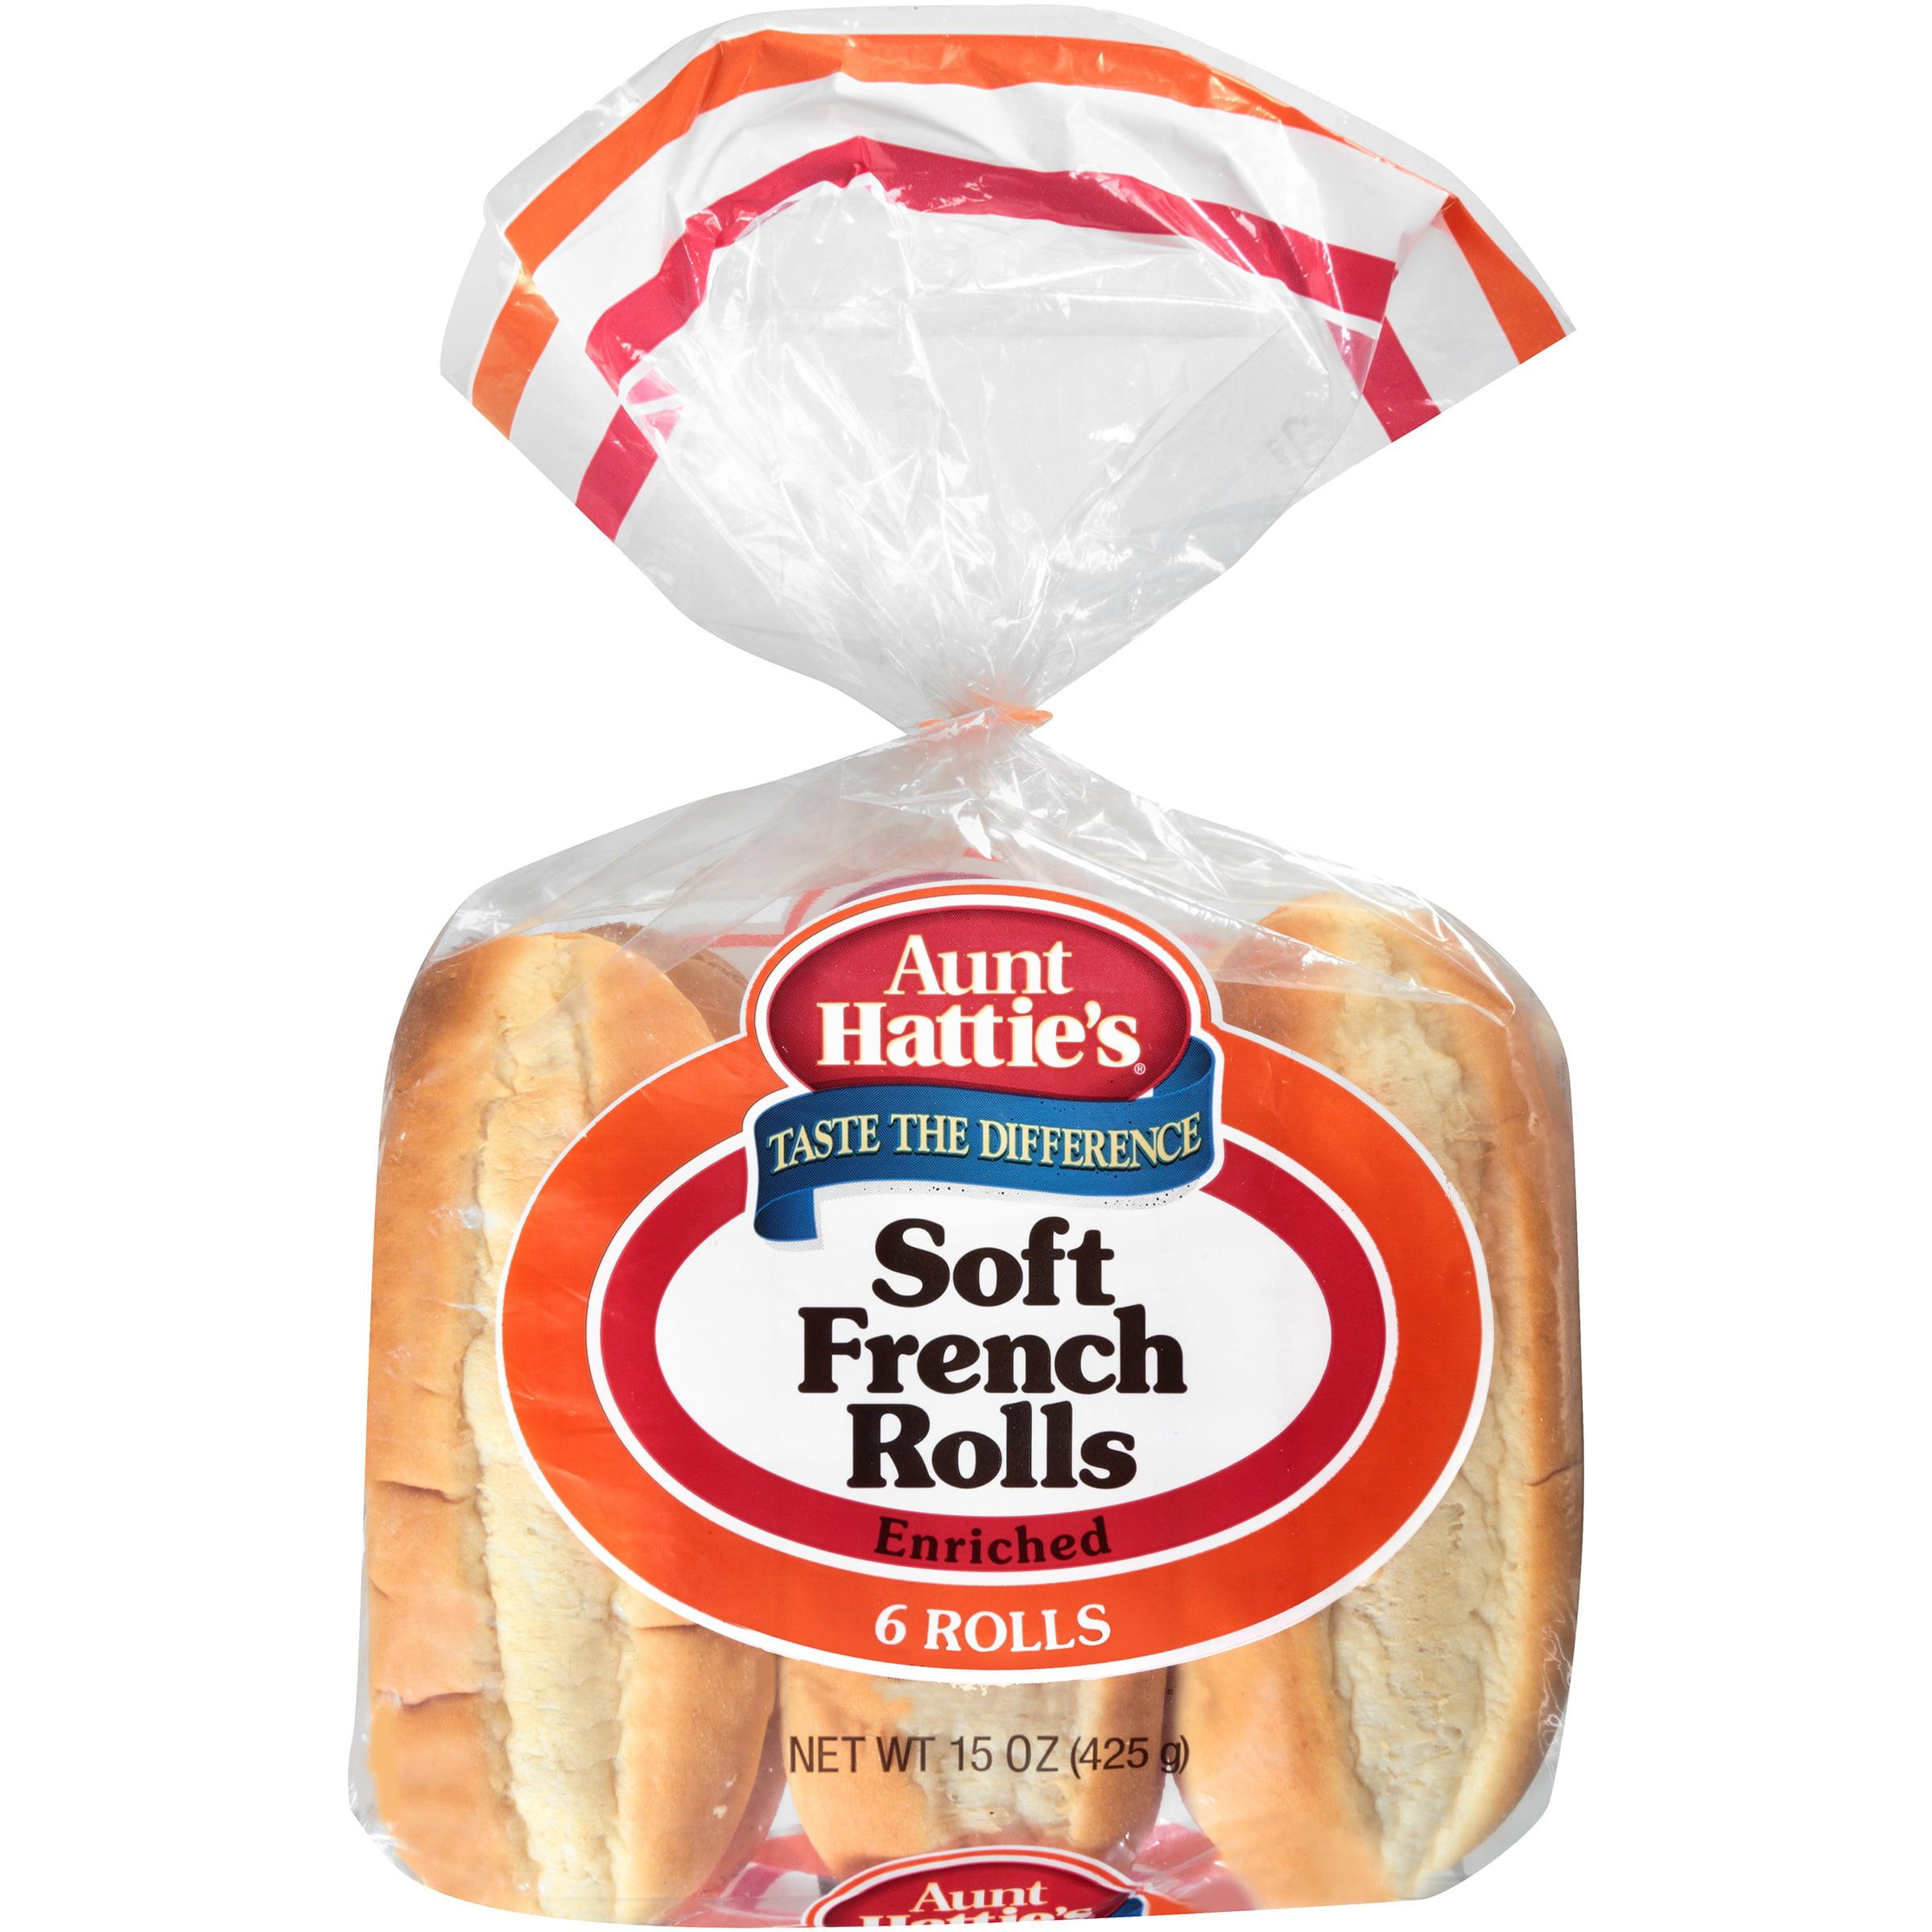 Aunt Hattie's® Enriched Soft French Rolls 6 ct Bag